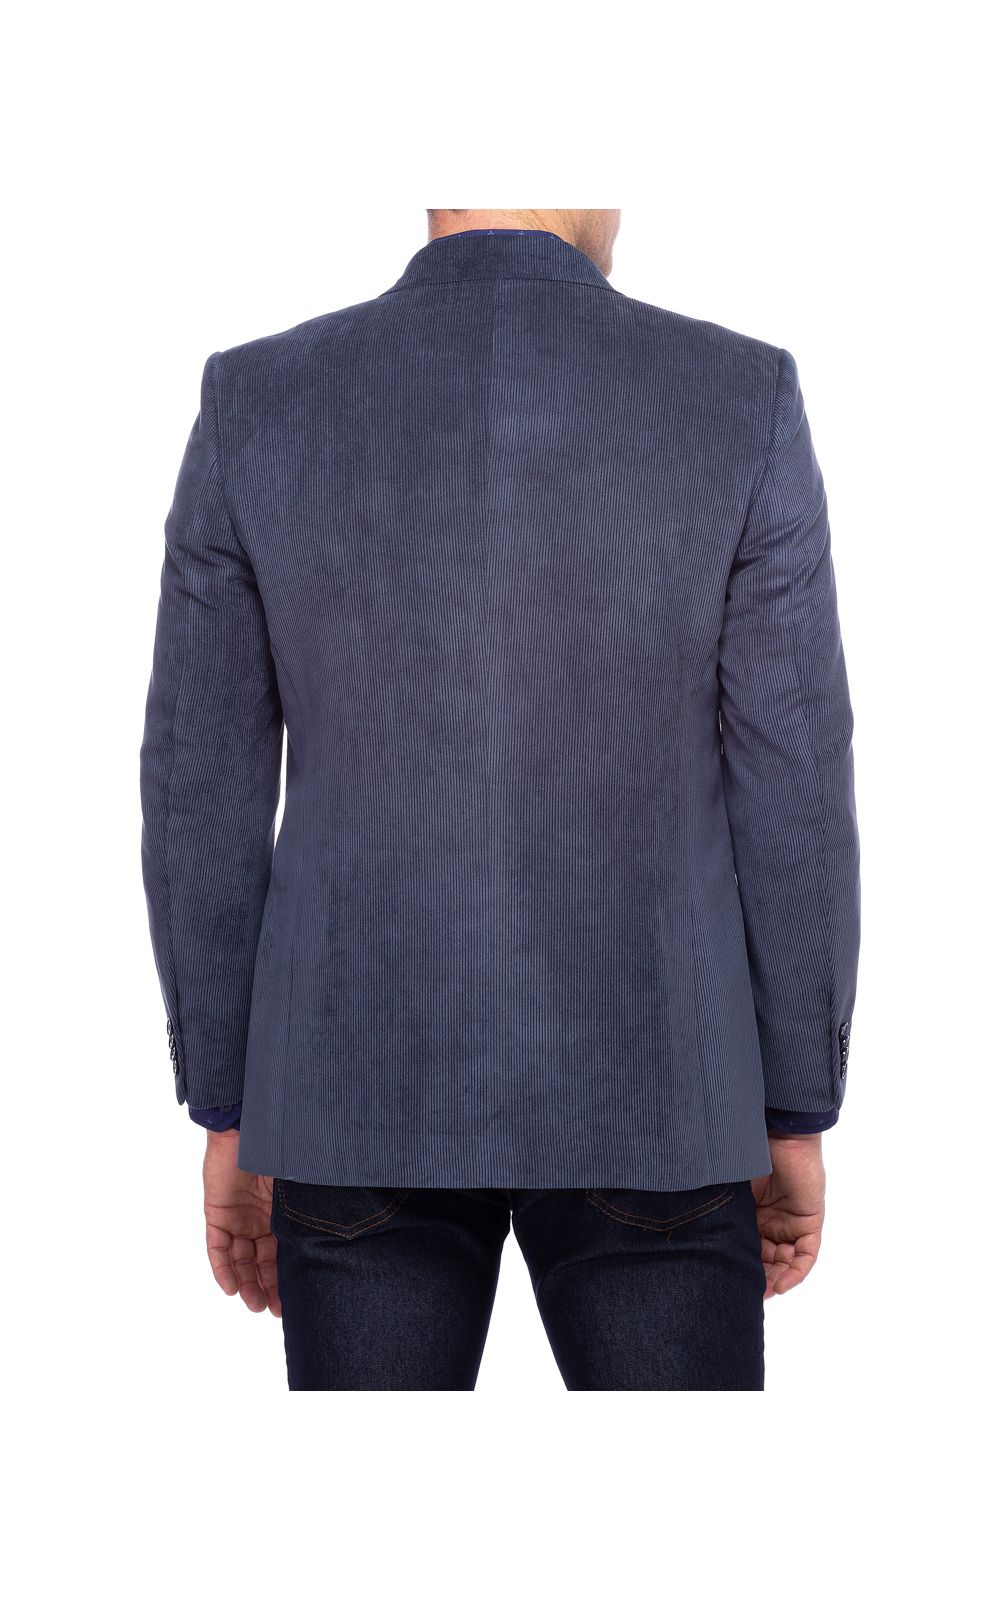 Foto 2 - Blazer Masculino Azul